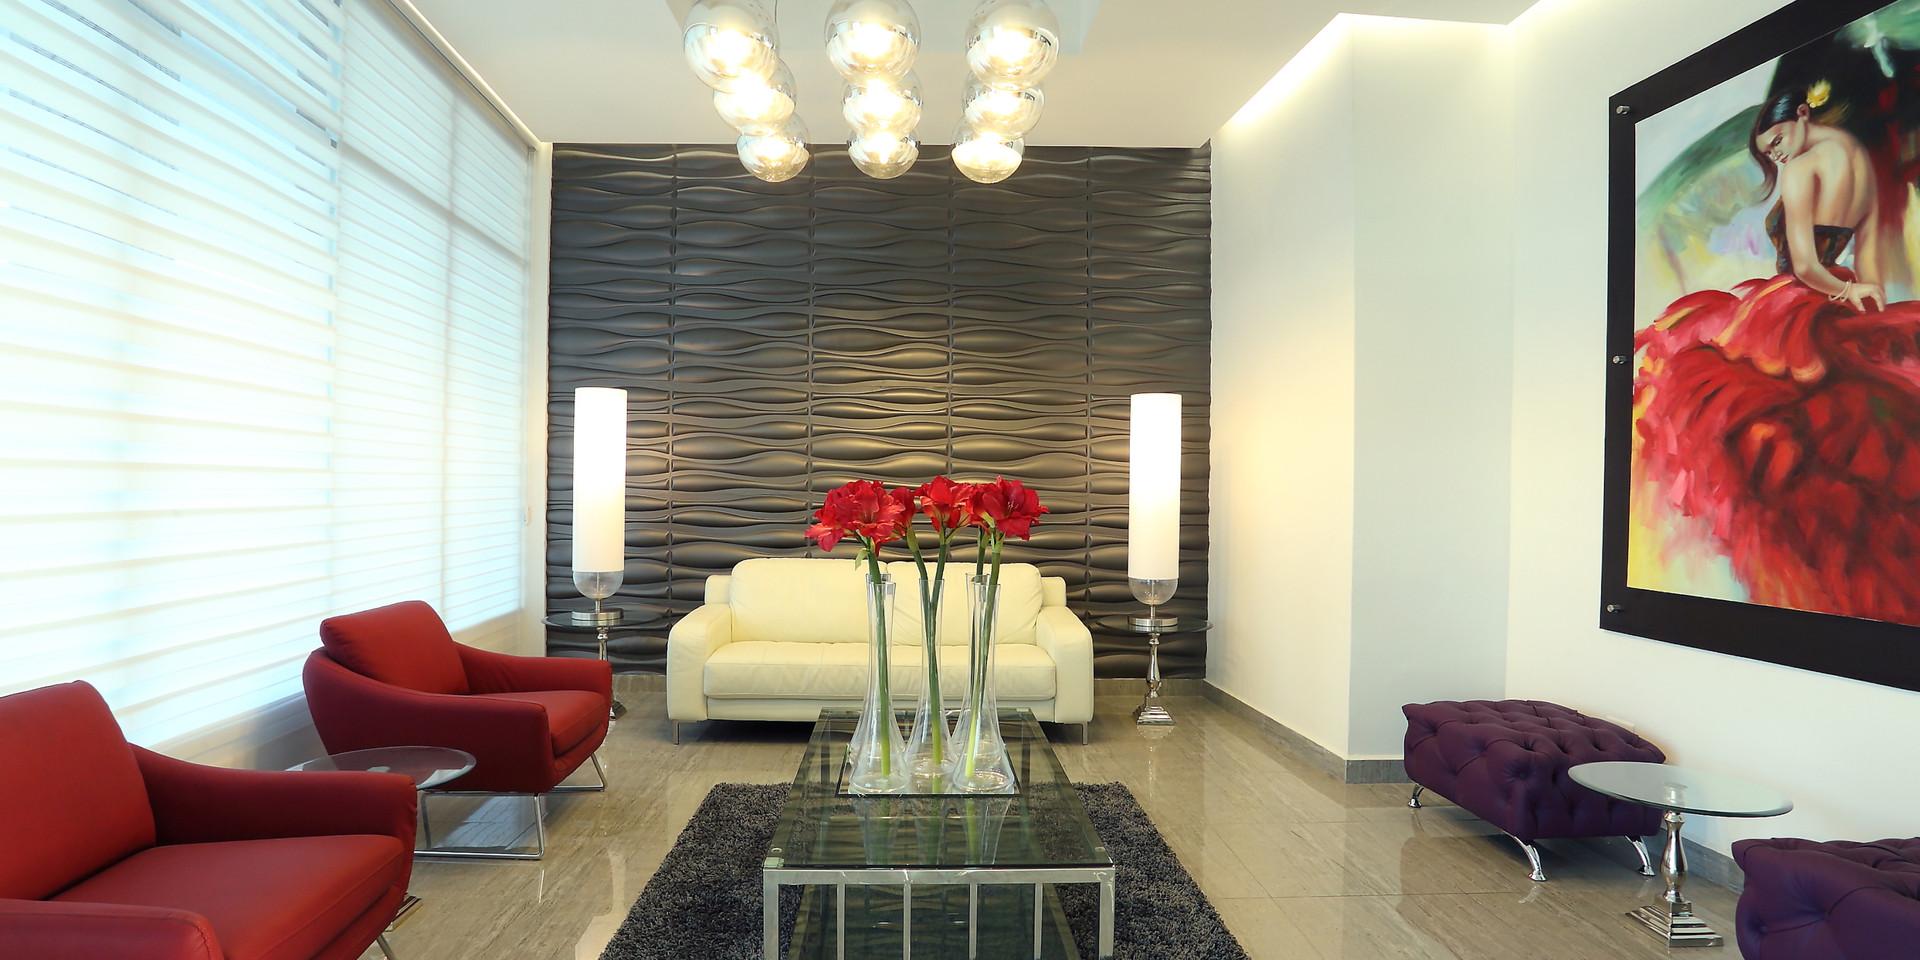 Lobby of Aranjuez Hotel & Suites